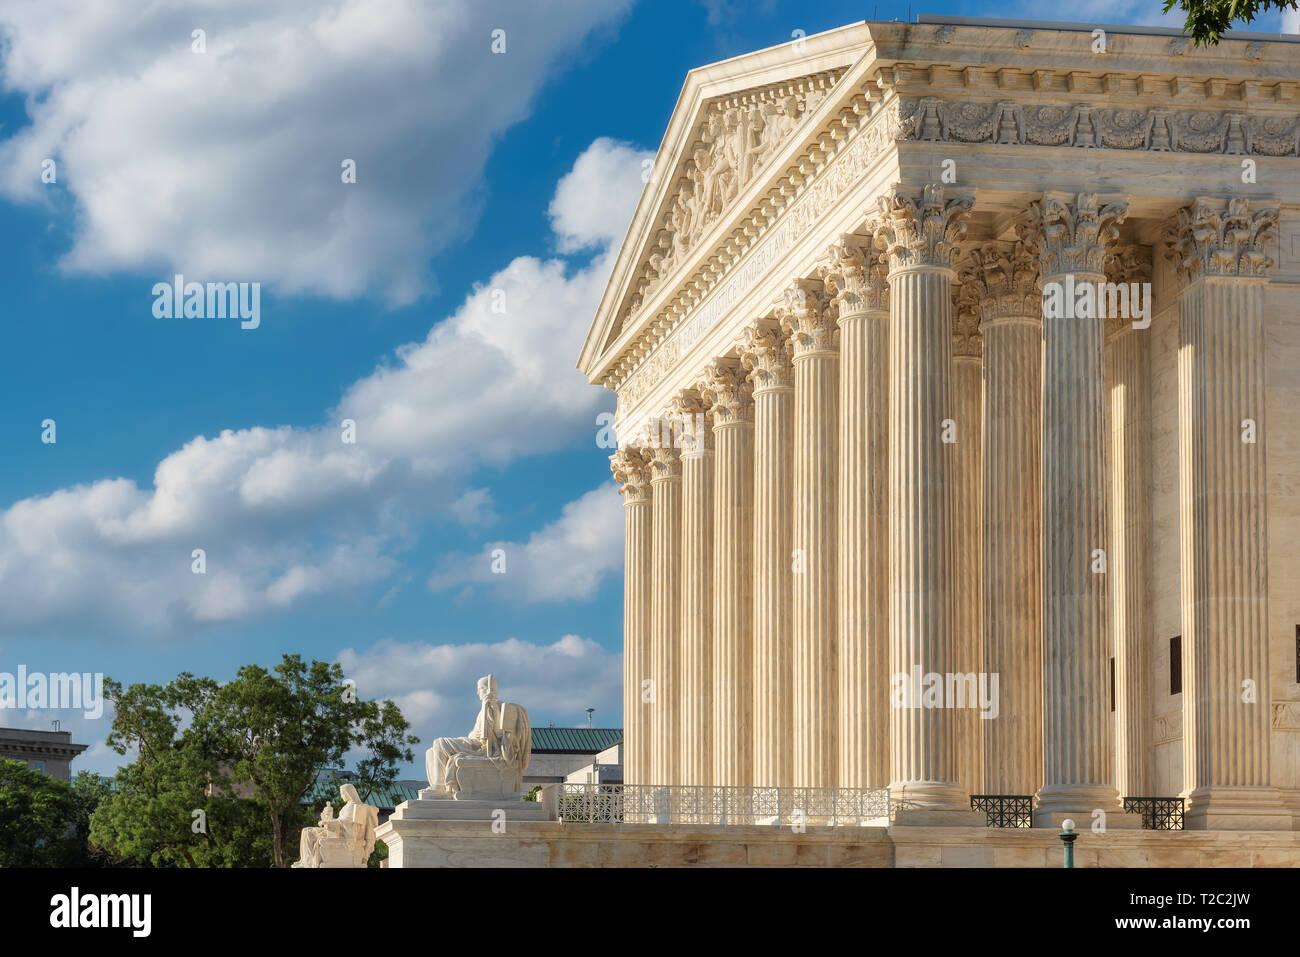 United States Supreme Court Building in Washington DC, USA. Stock Photo